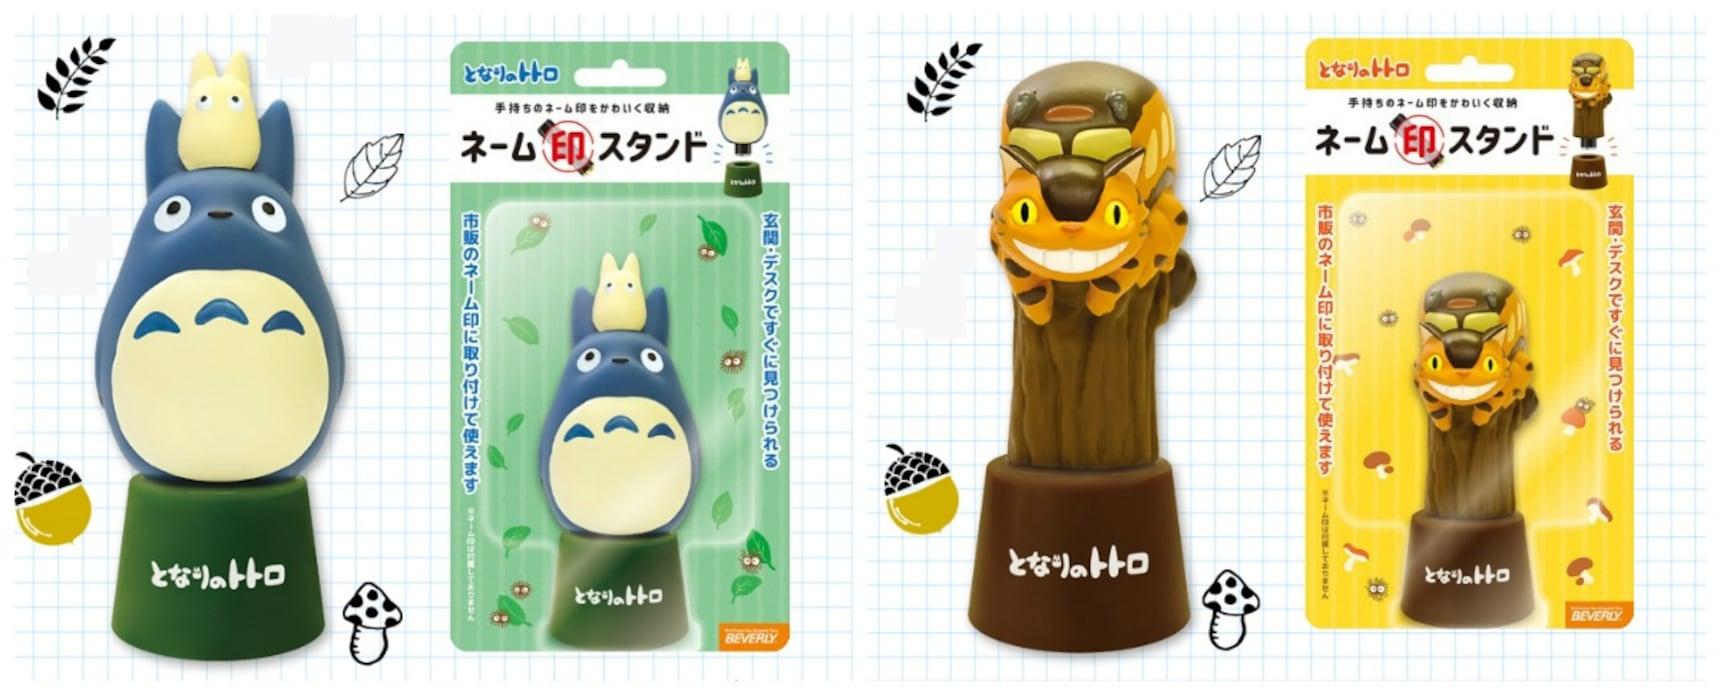 Add Studio Ghibli Magic to Your Personal Seal